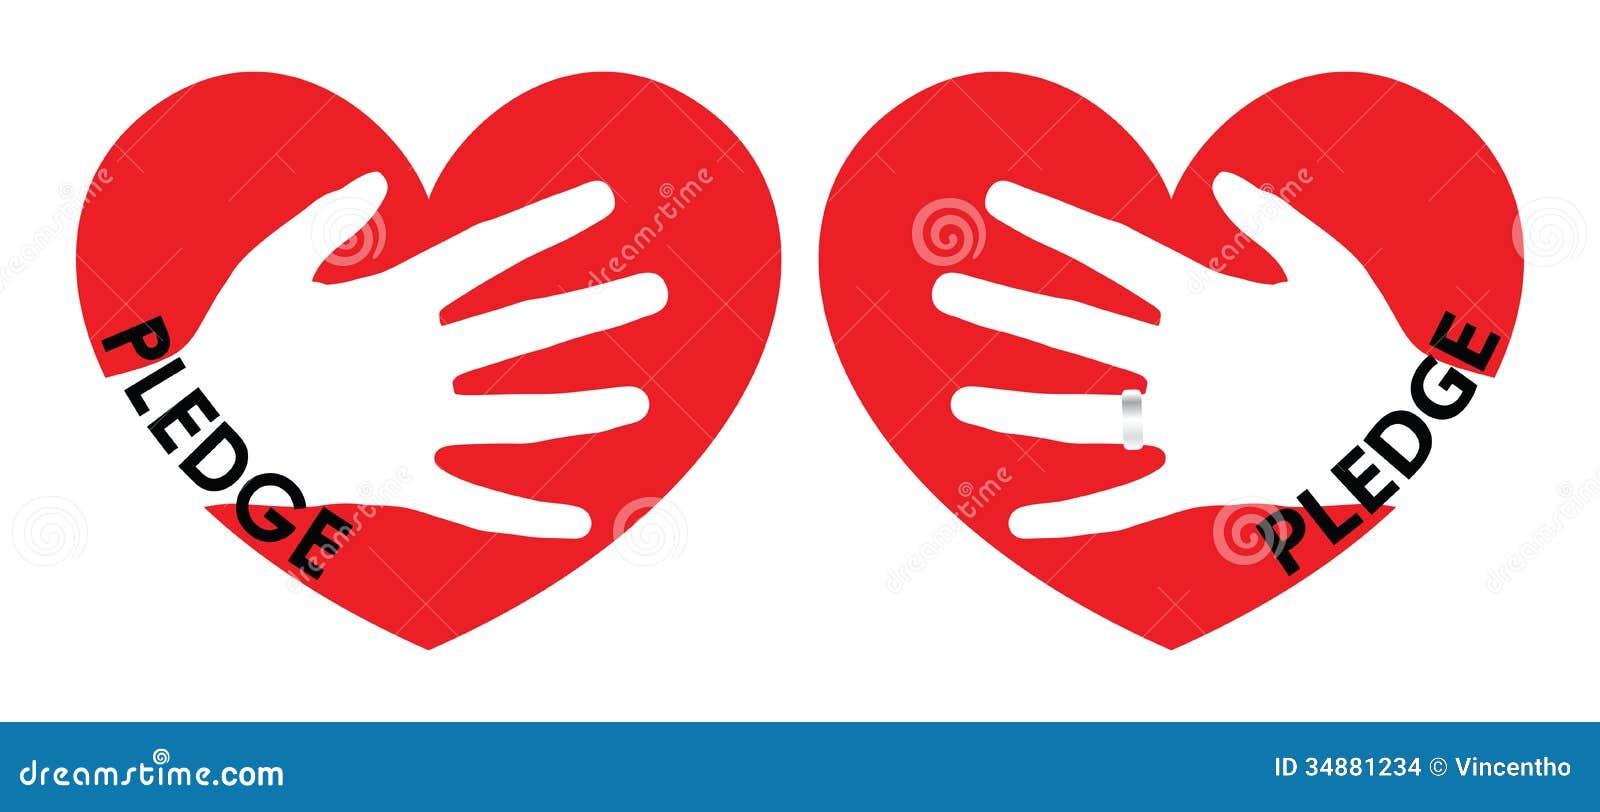 Pledge Of Love Illustration Stock Vector Illustration Of